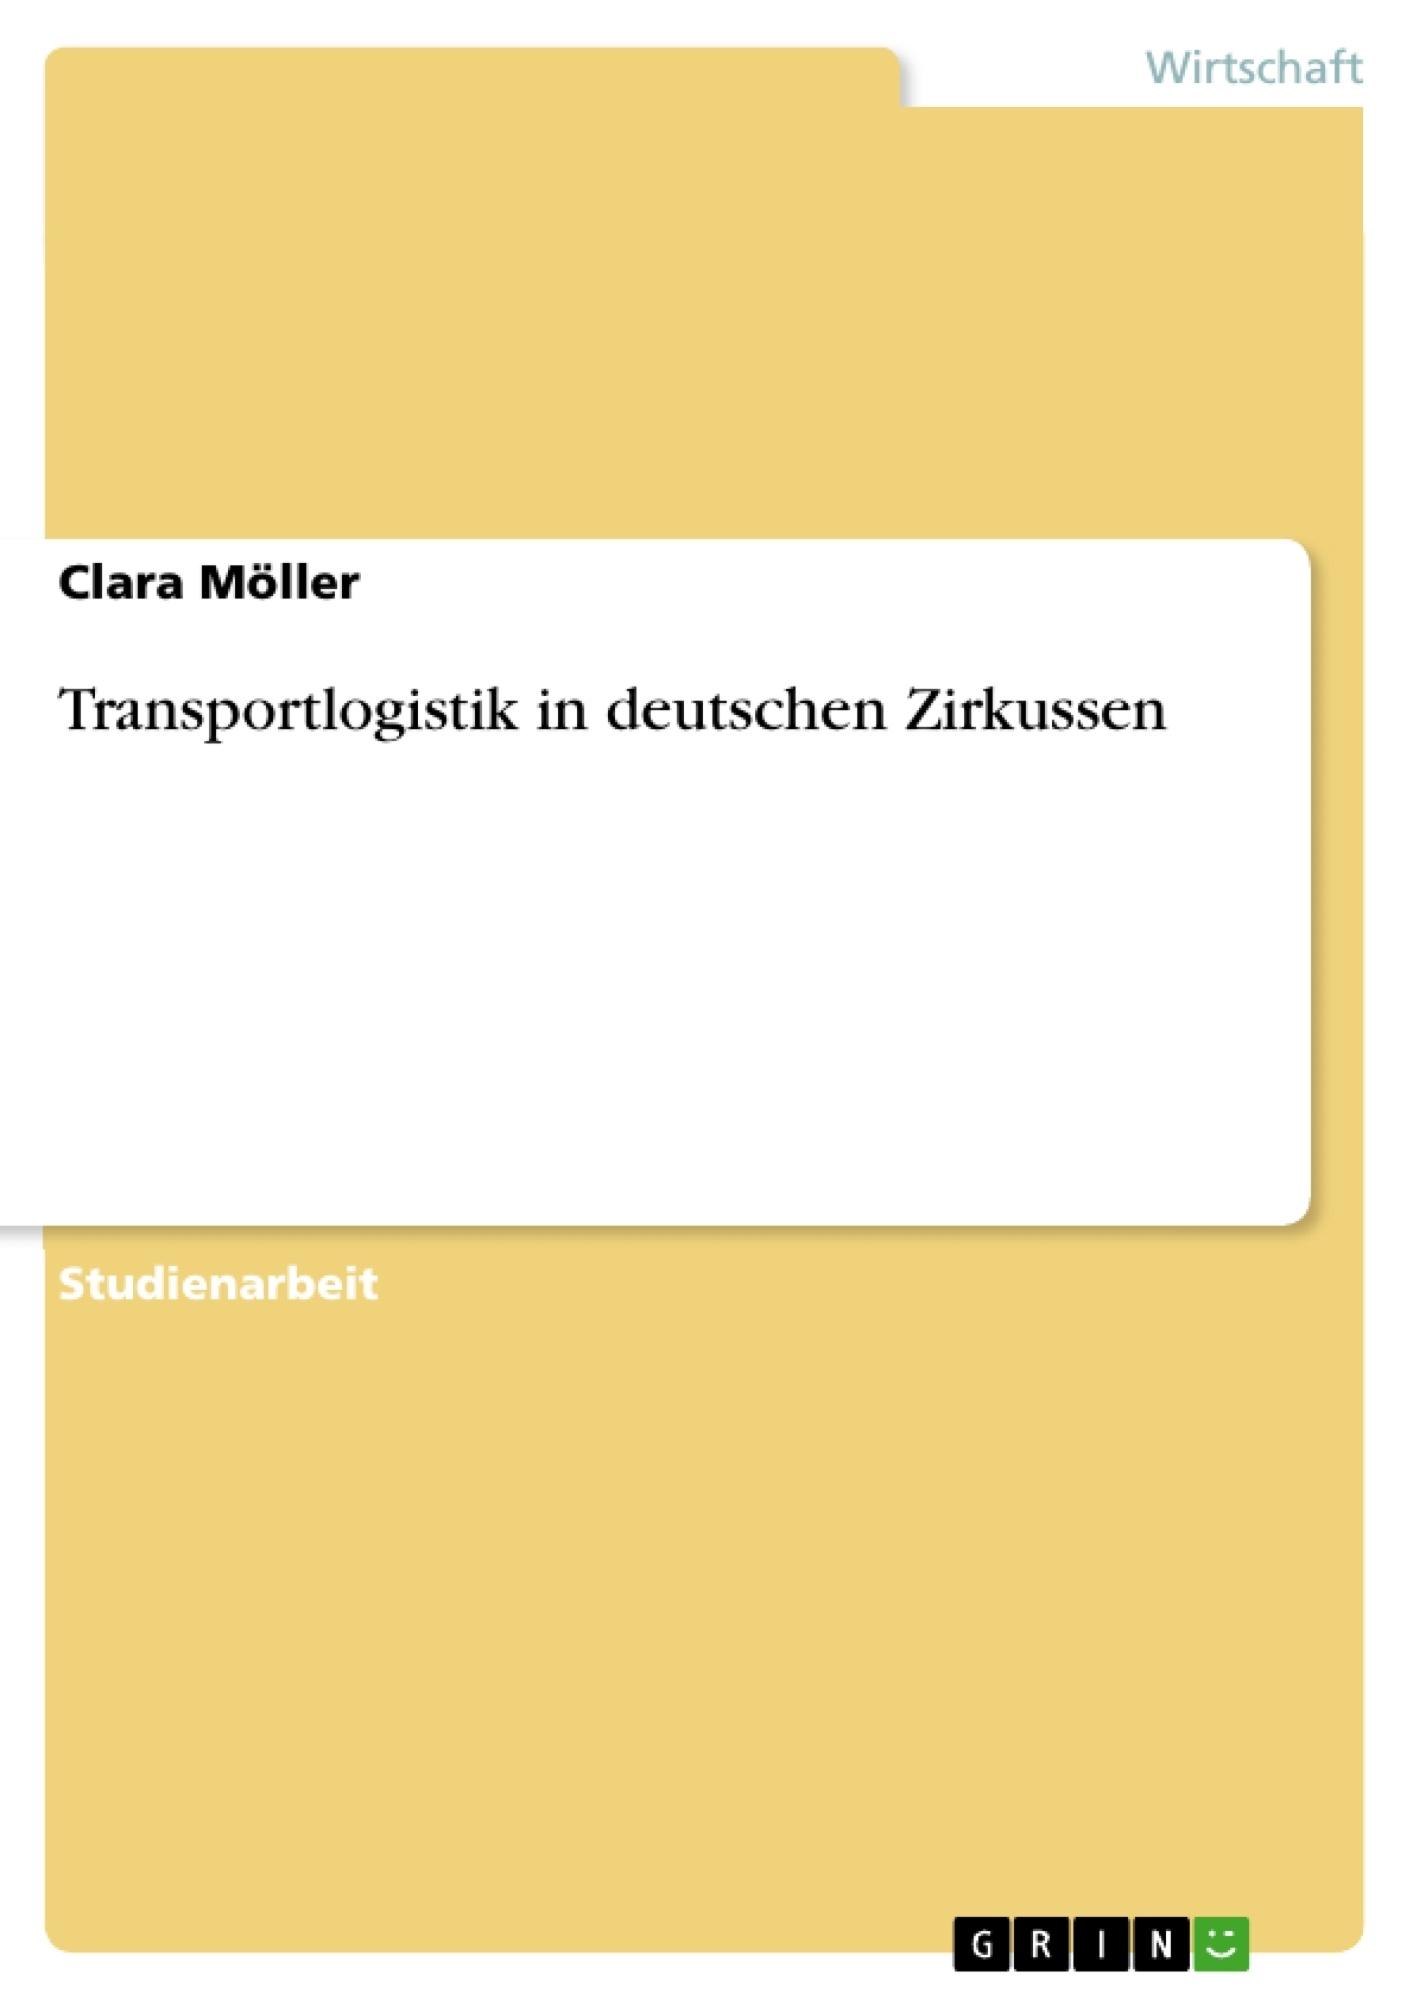 Titel: Transportlogistik in deutschen Zirkussen